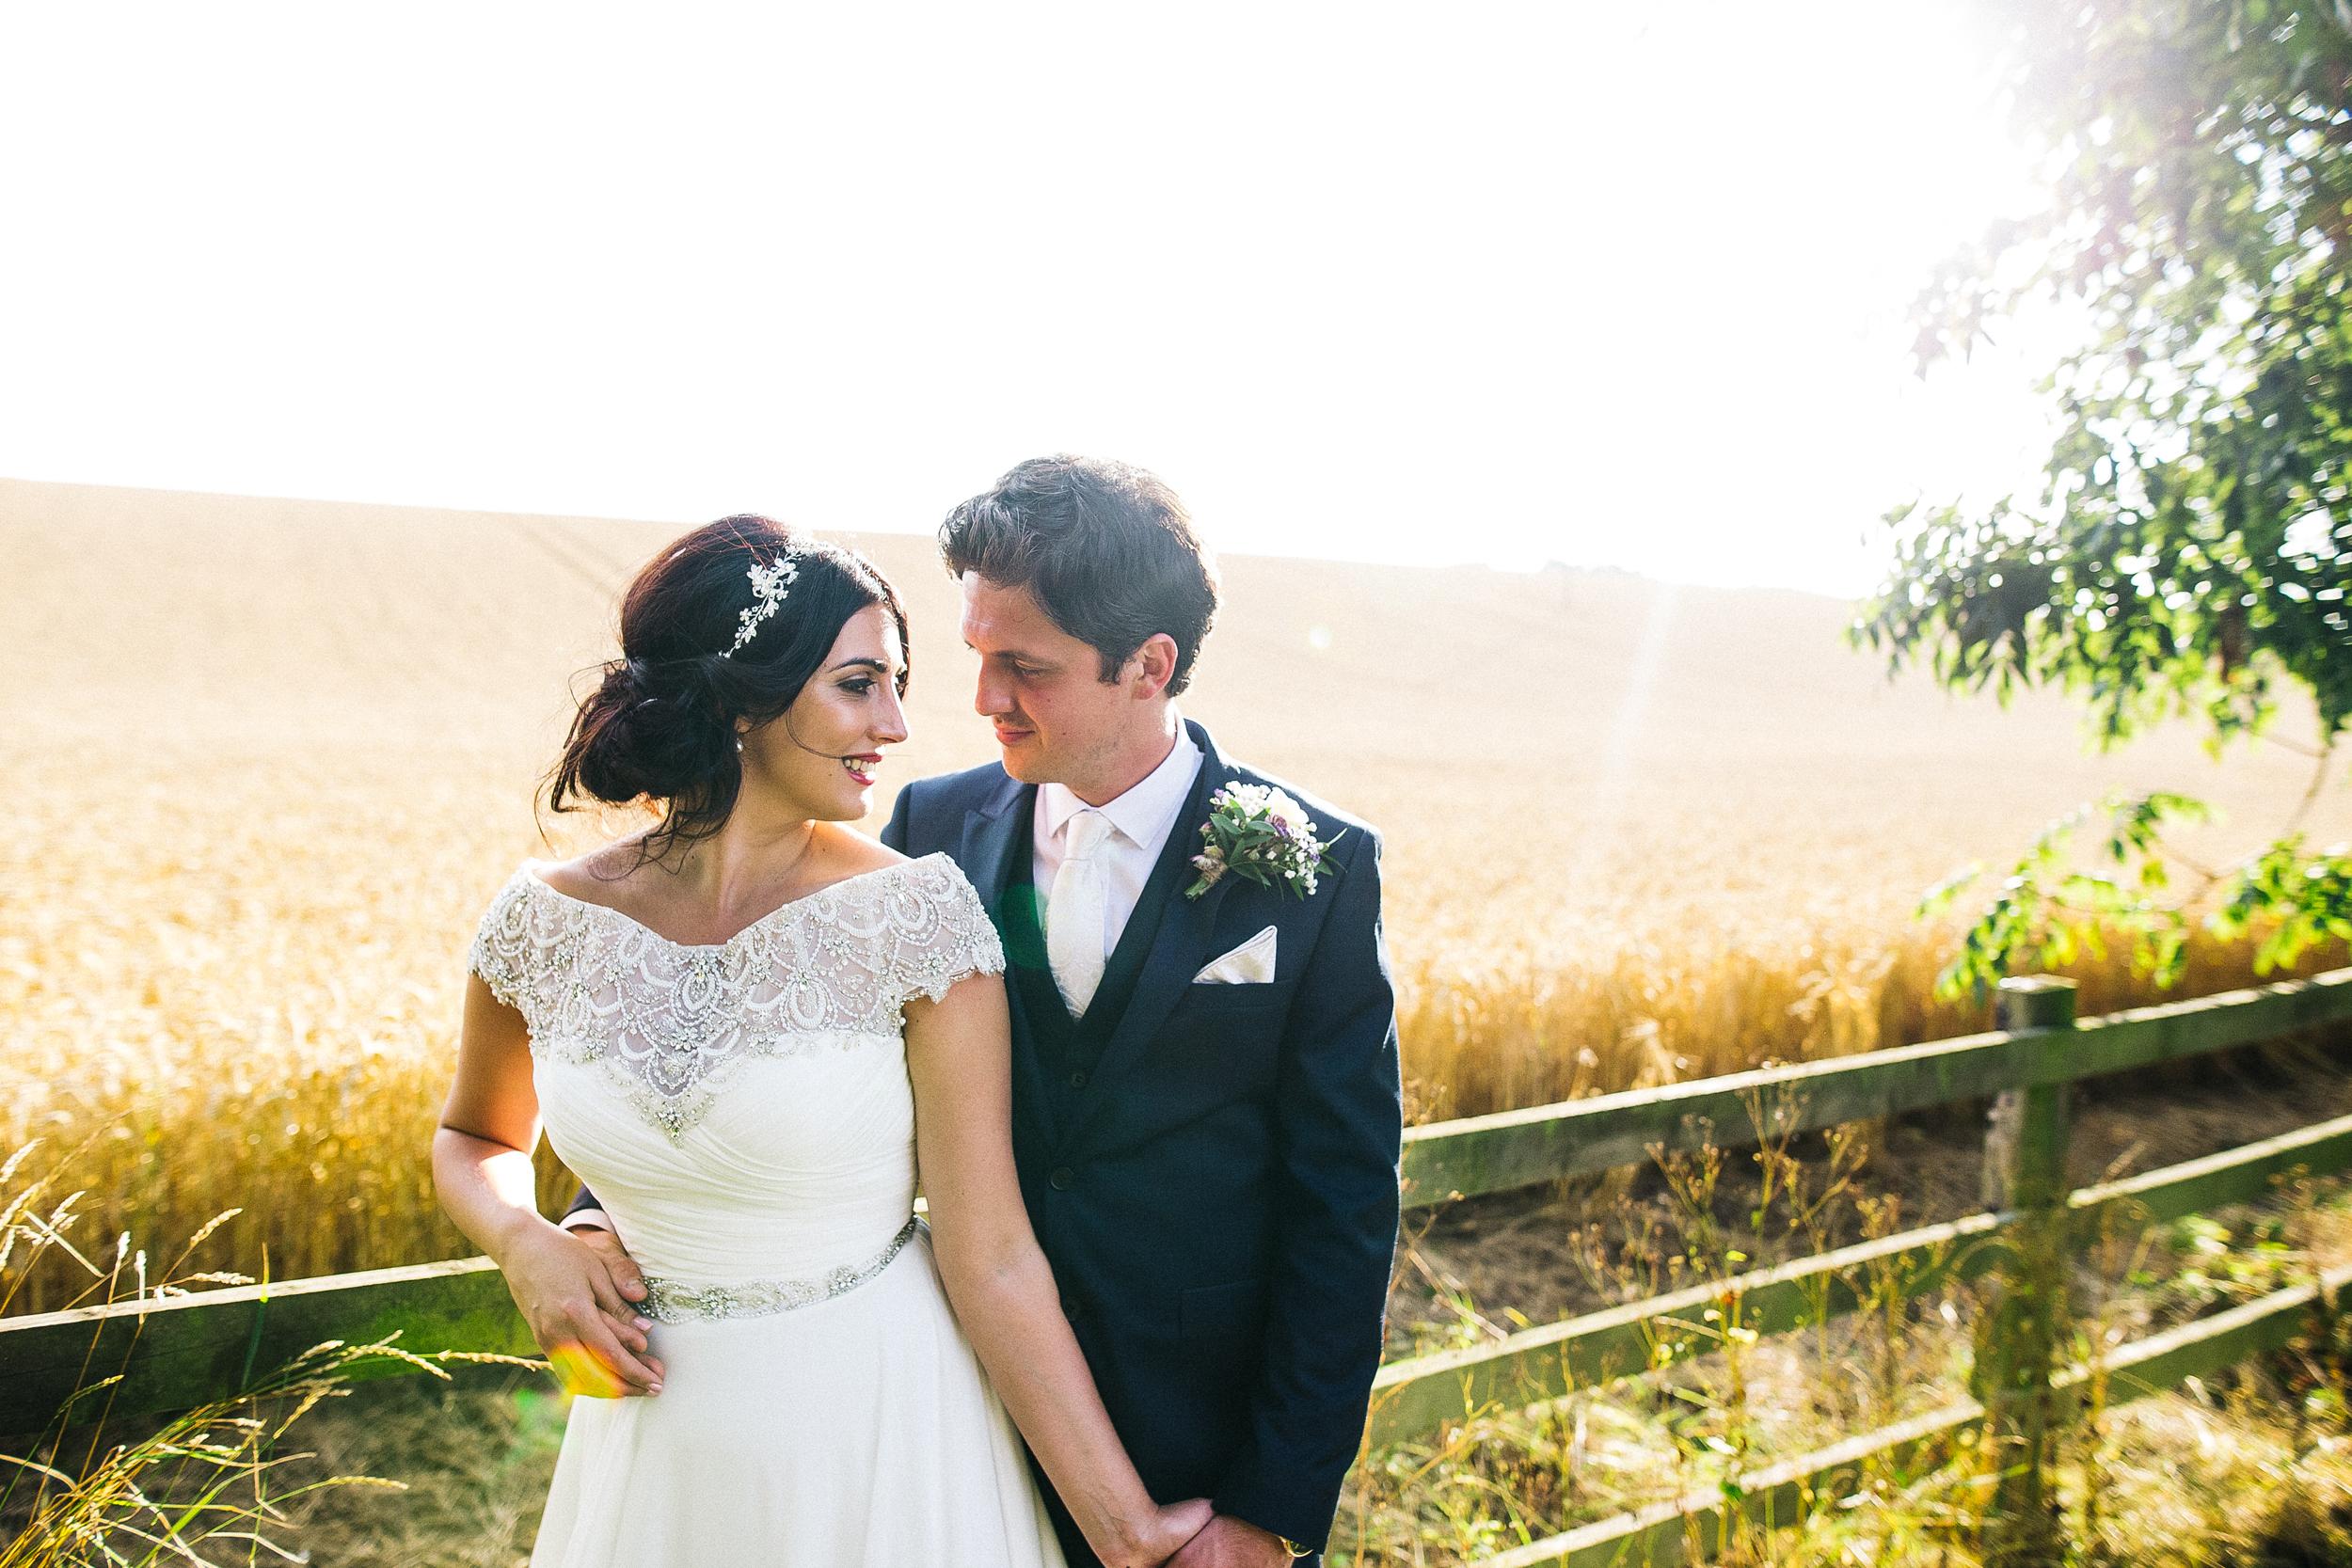 creative-wedding-photography-teesside-north-east-yorkshire-32.jpg